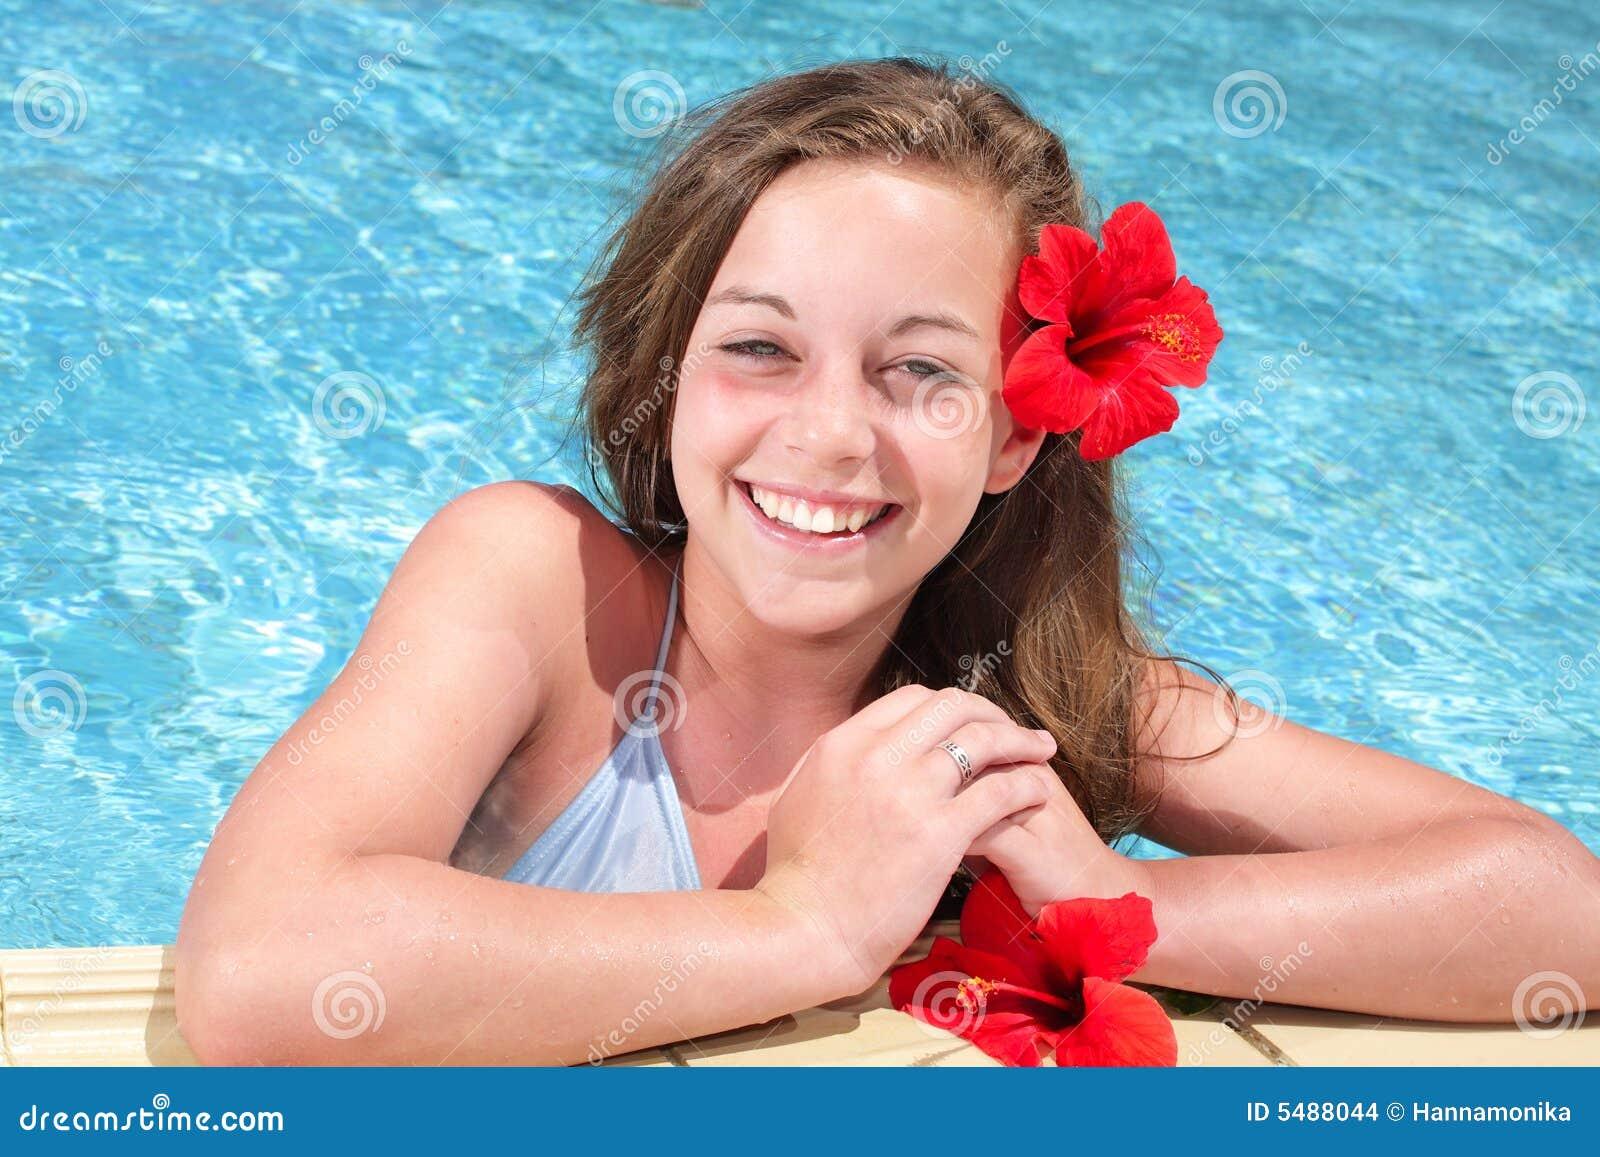 8mb sec adolescente fresco